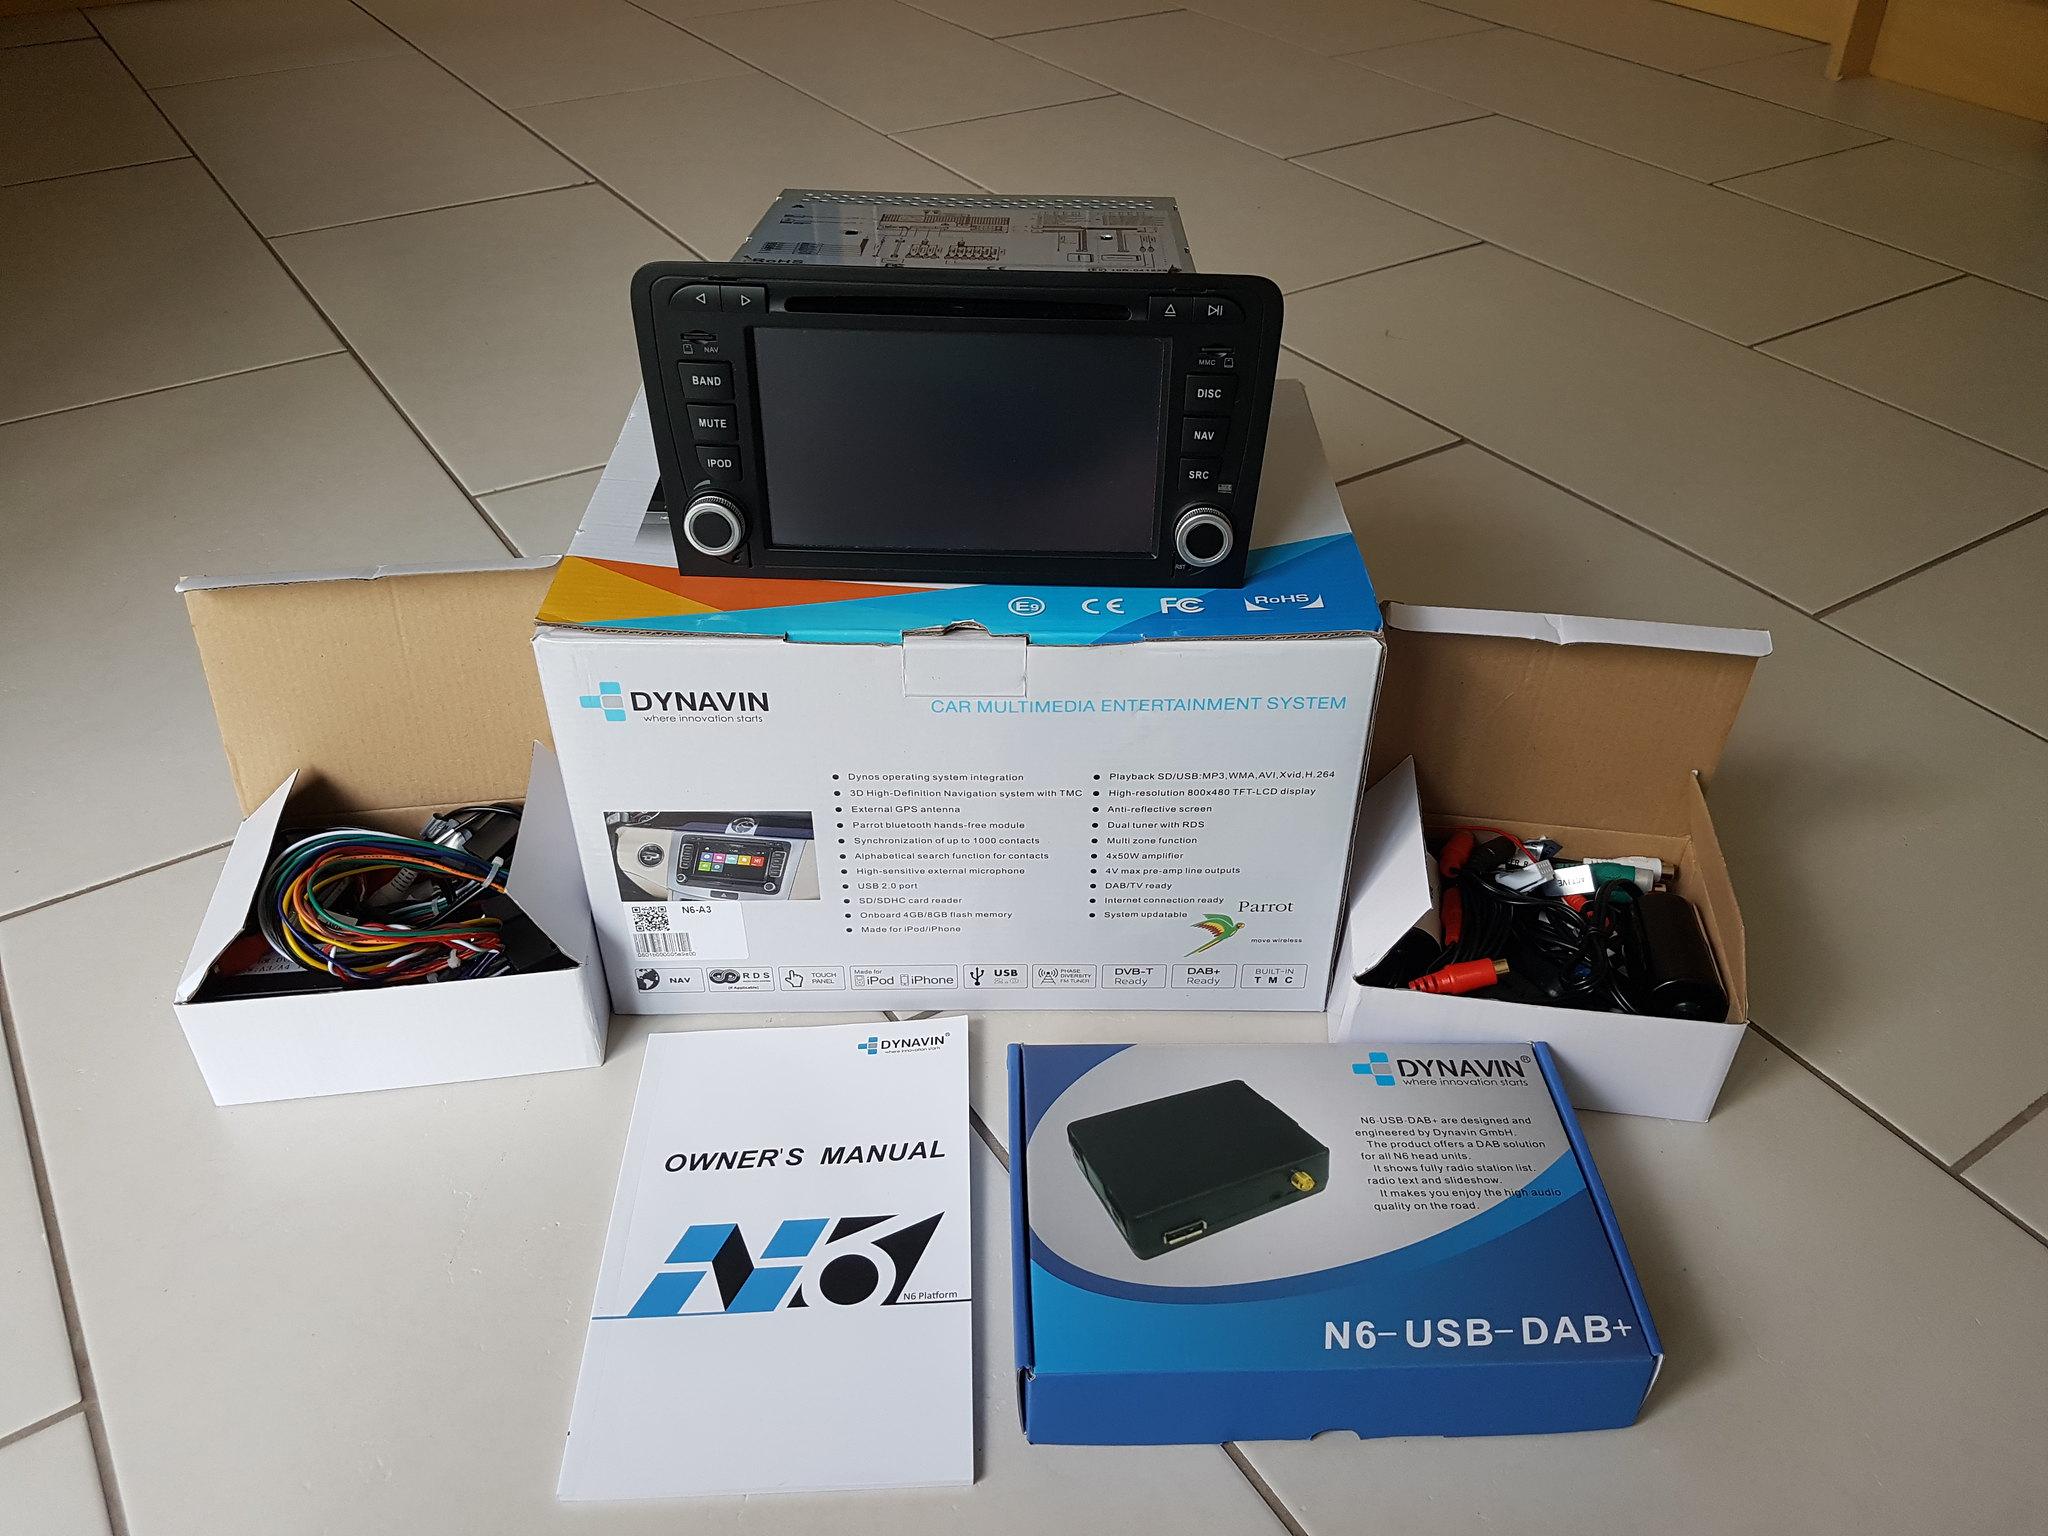 For Sale - Dynavin N6-A3 - Audi fit - Sat-Nav GPS, Bluetooth, MP3